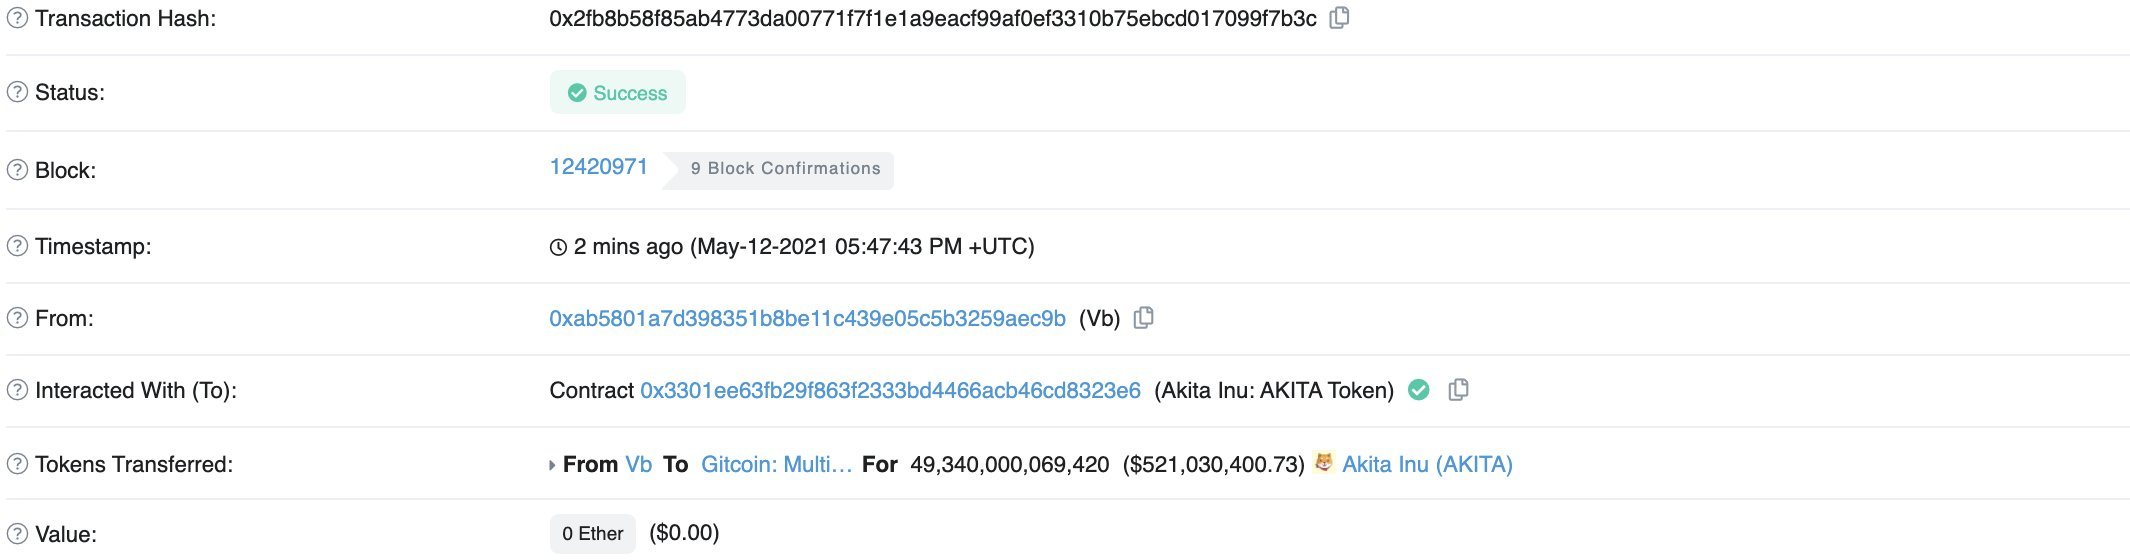 Vitalik Buterin transaction to Gitcoin